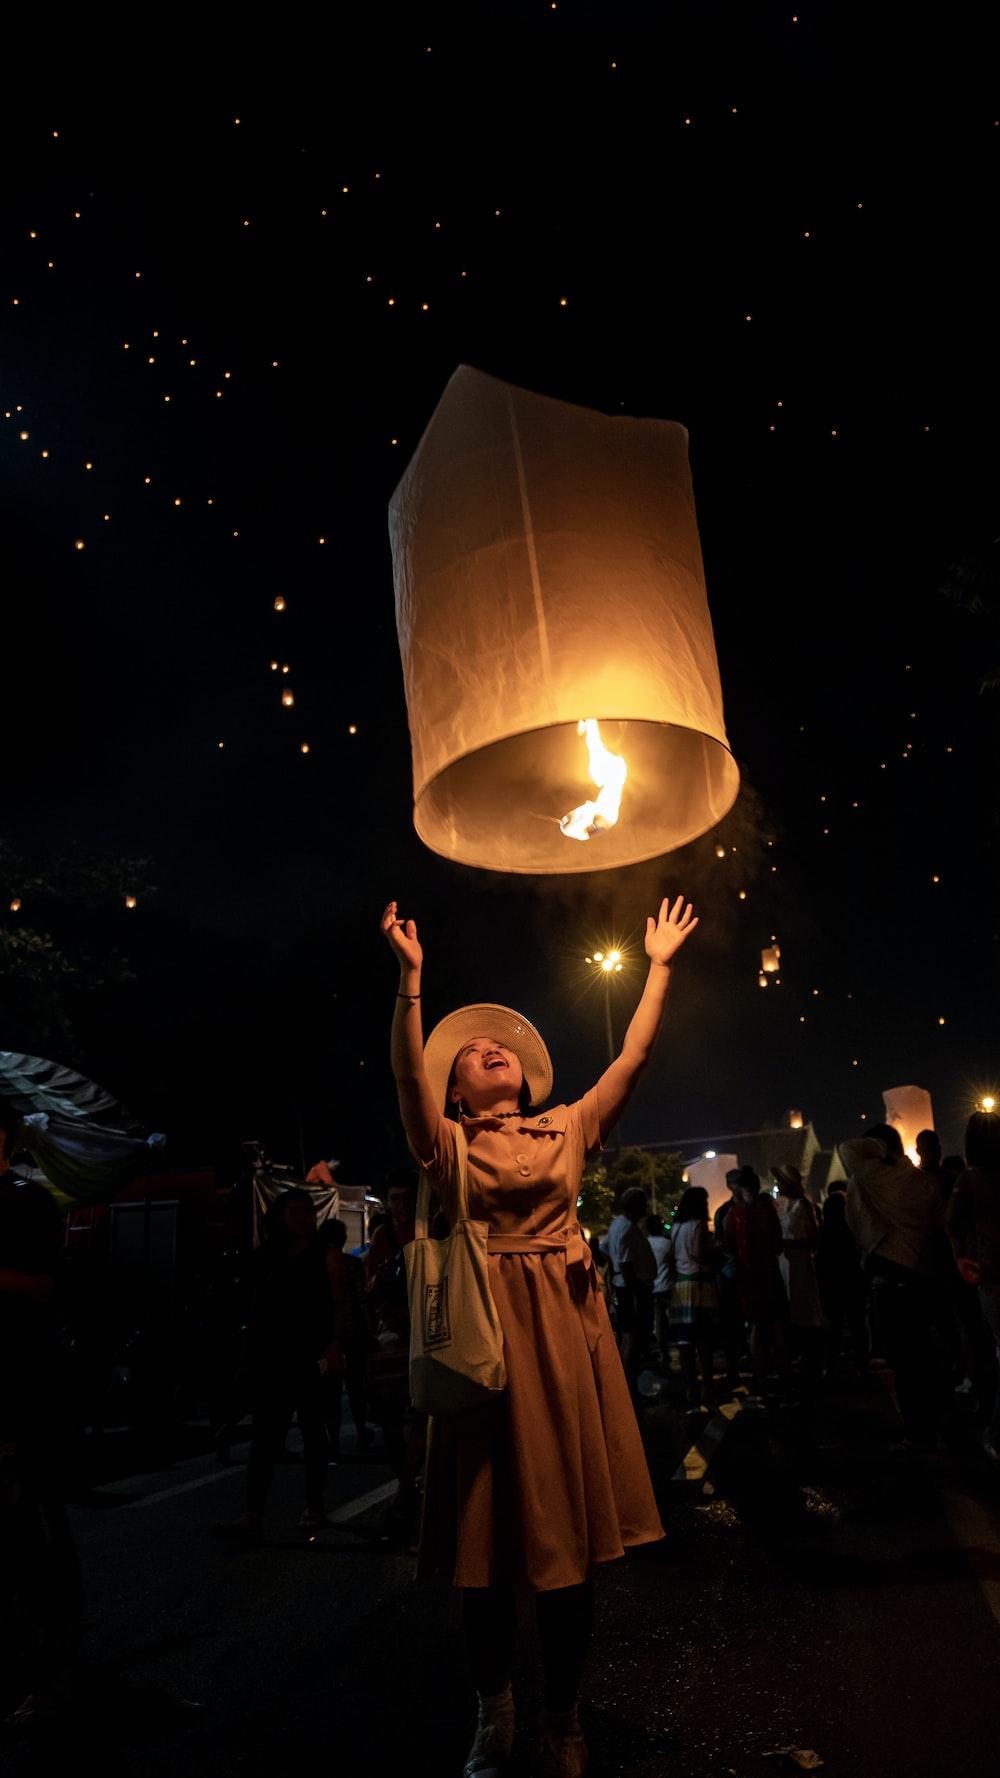 woman in brown dress holds sky lantern